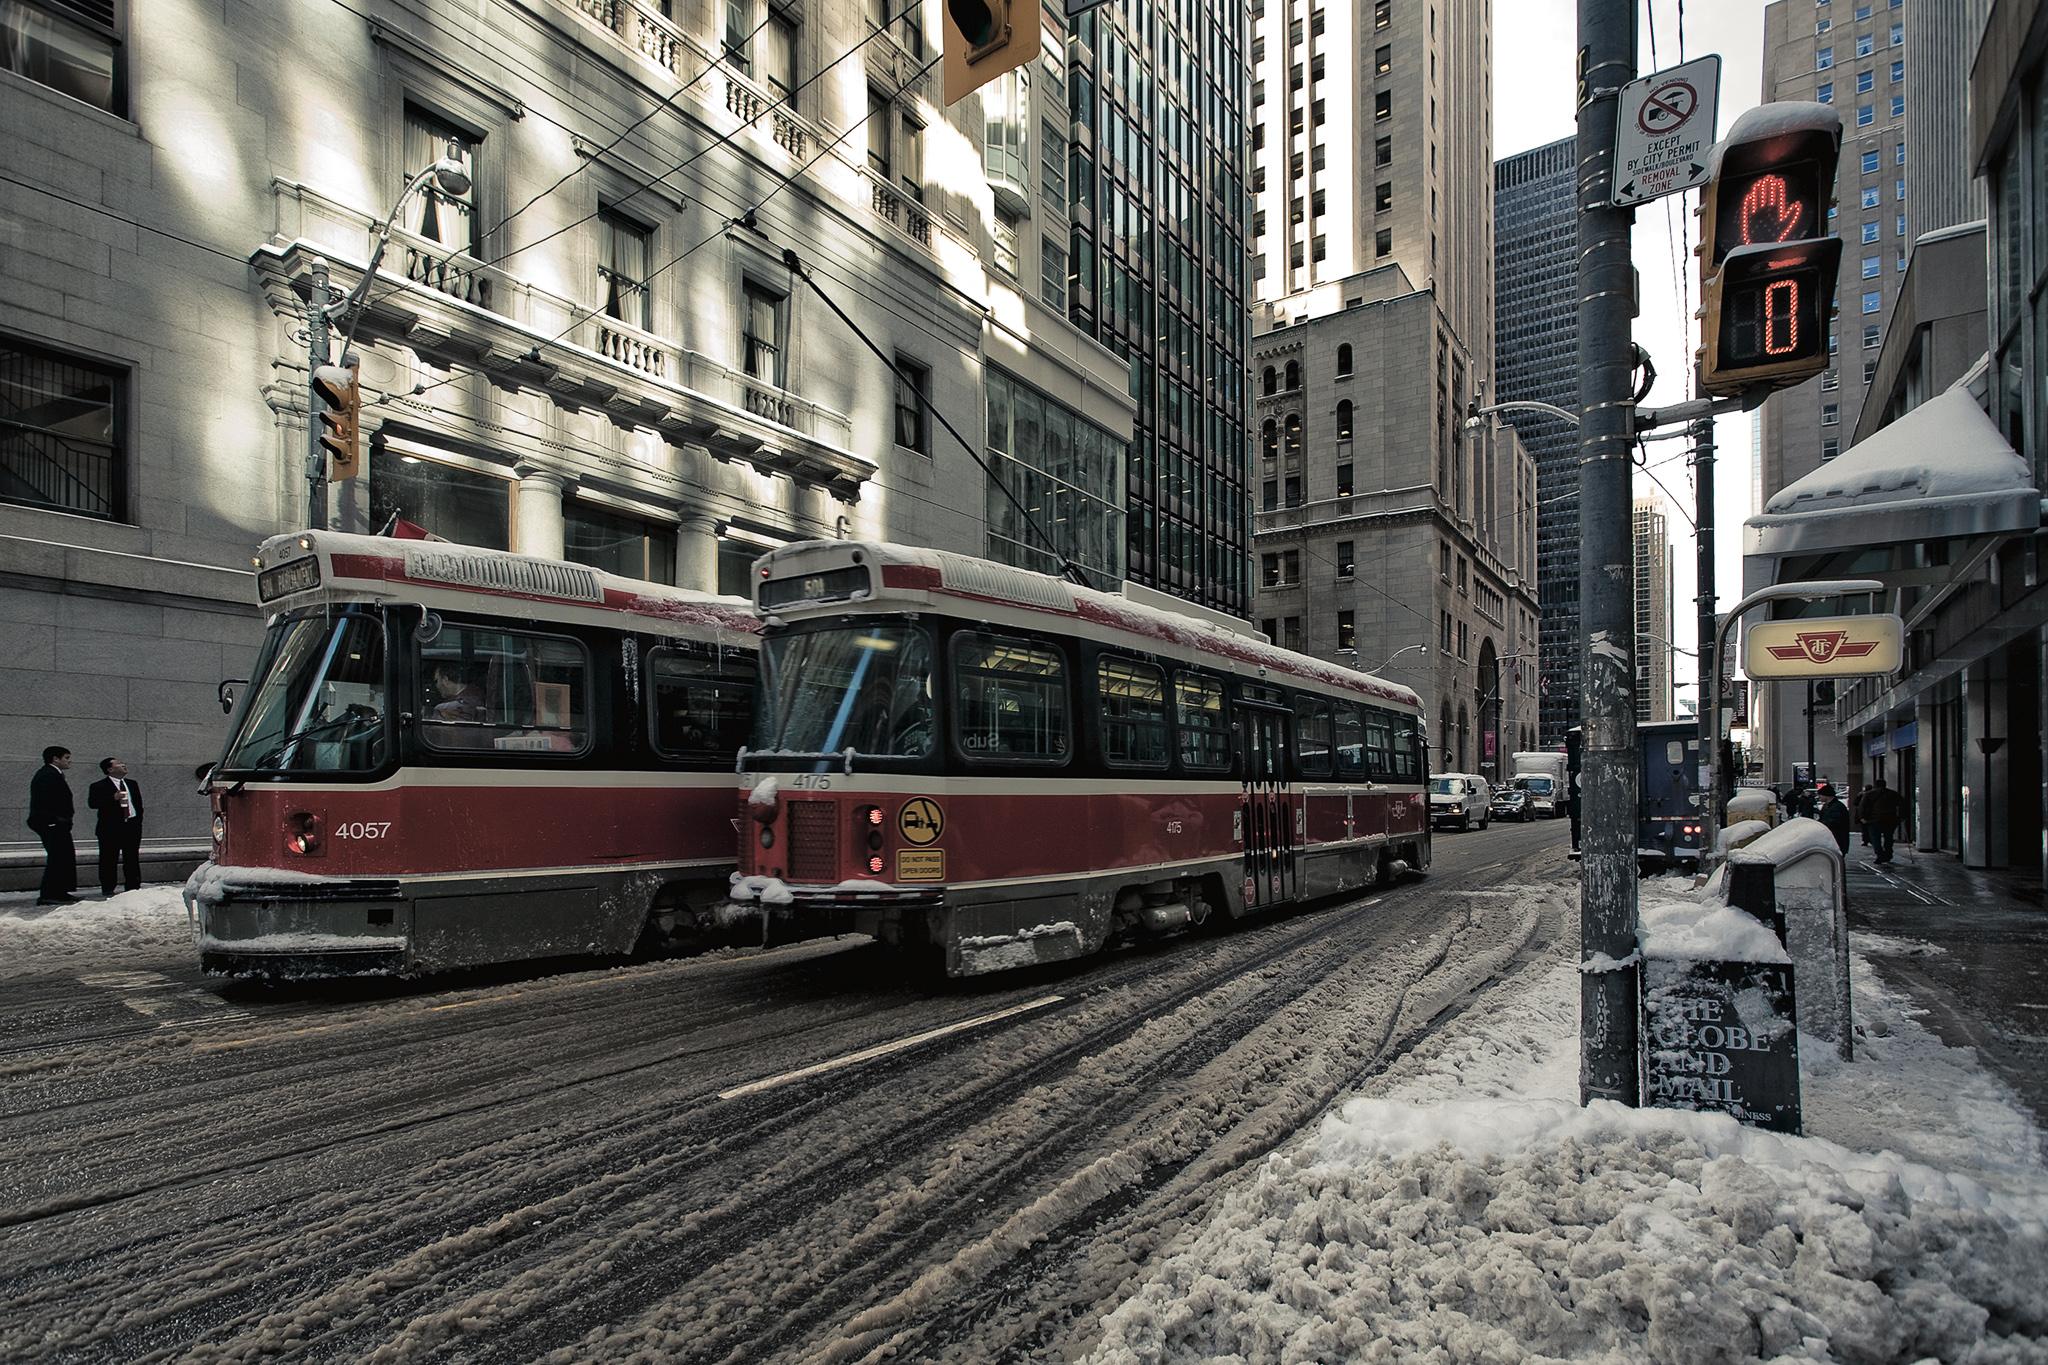 8x12_two_streetcars_king_yonge_snow_day_zero.jpg